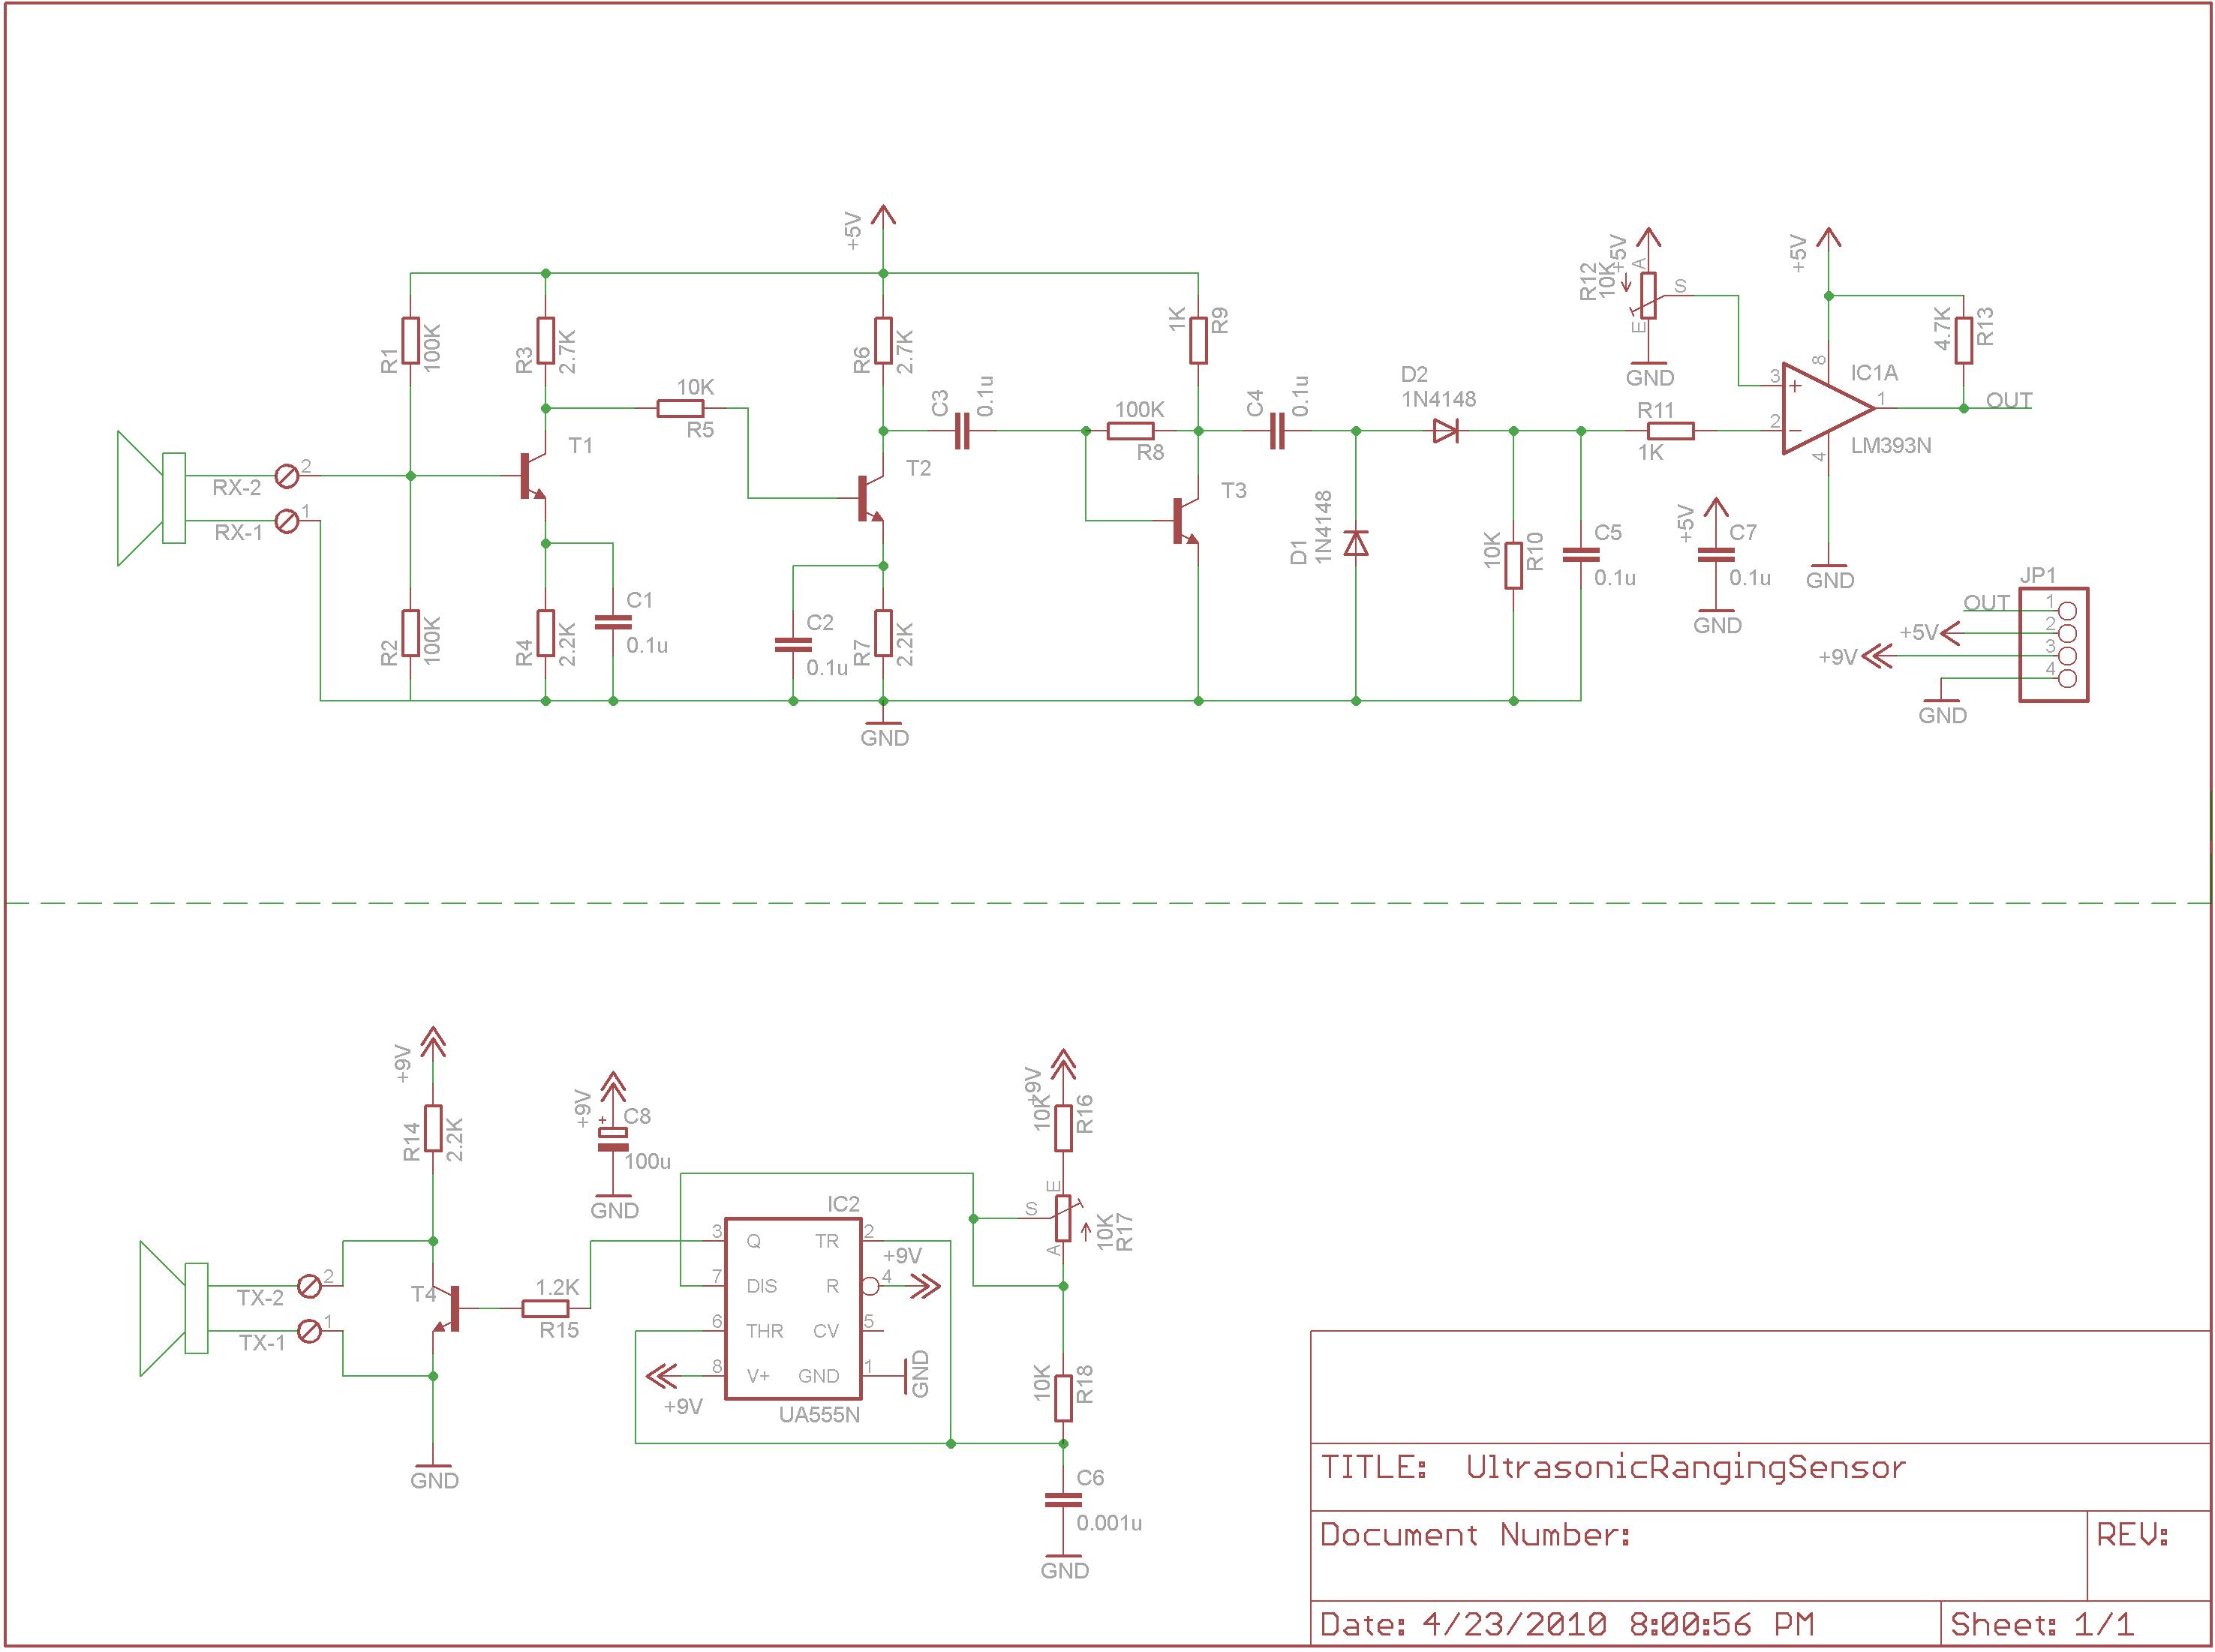 Ultrasonic Ranging Sensor on 40khz Ultrasonic Sensor Schematic